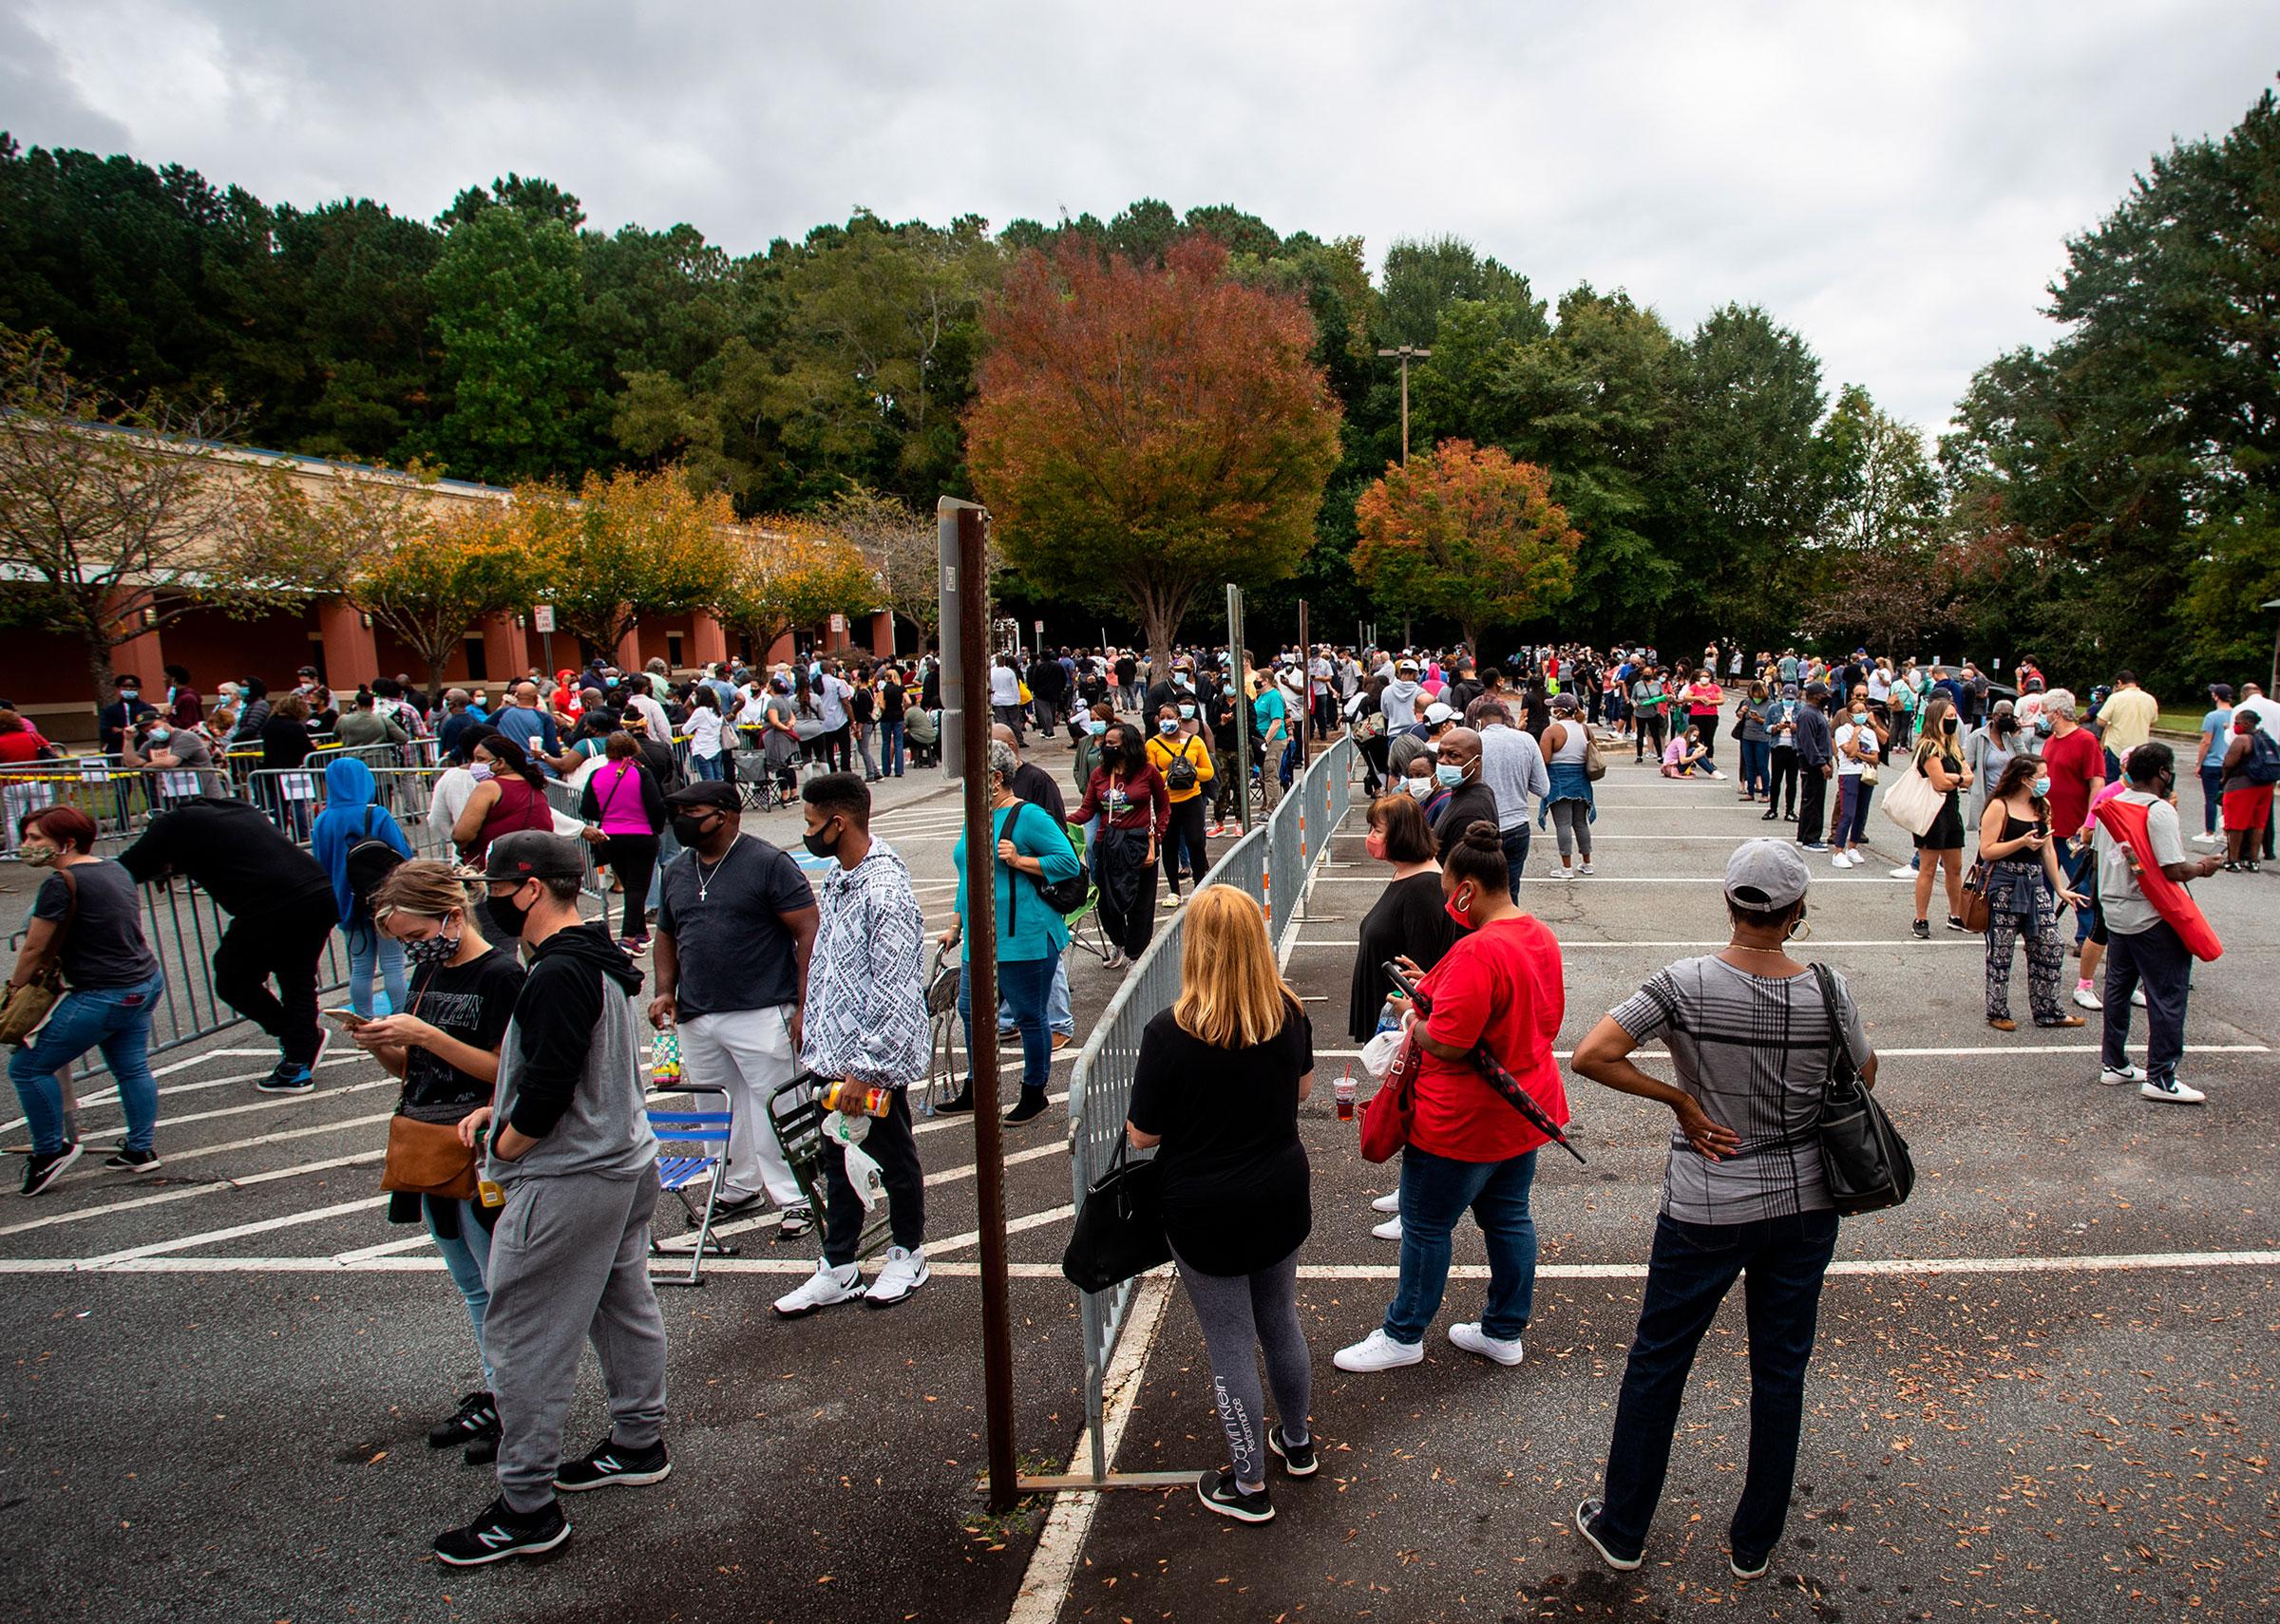 People in Marietta, Georgia, wait in line to vote on October 12.